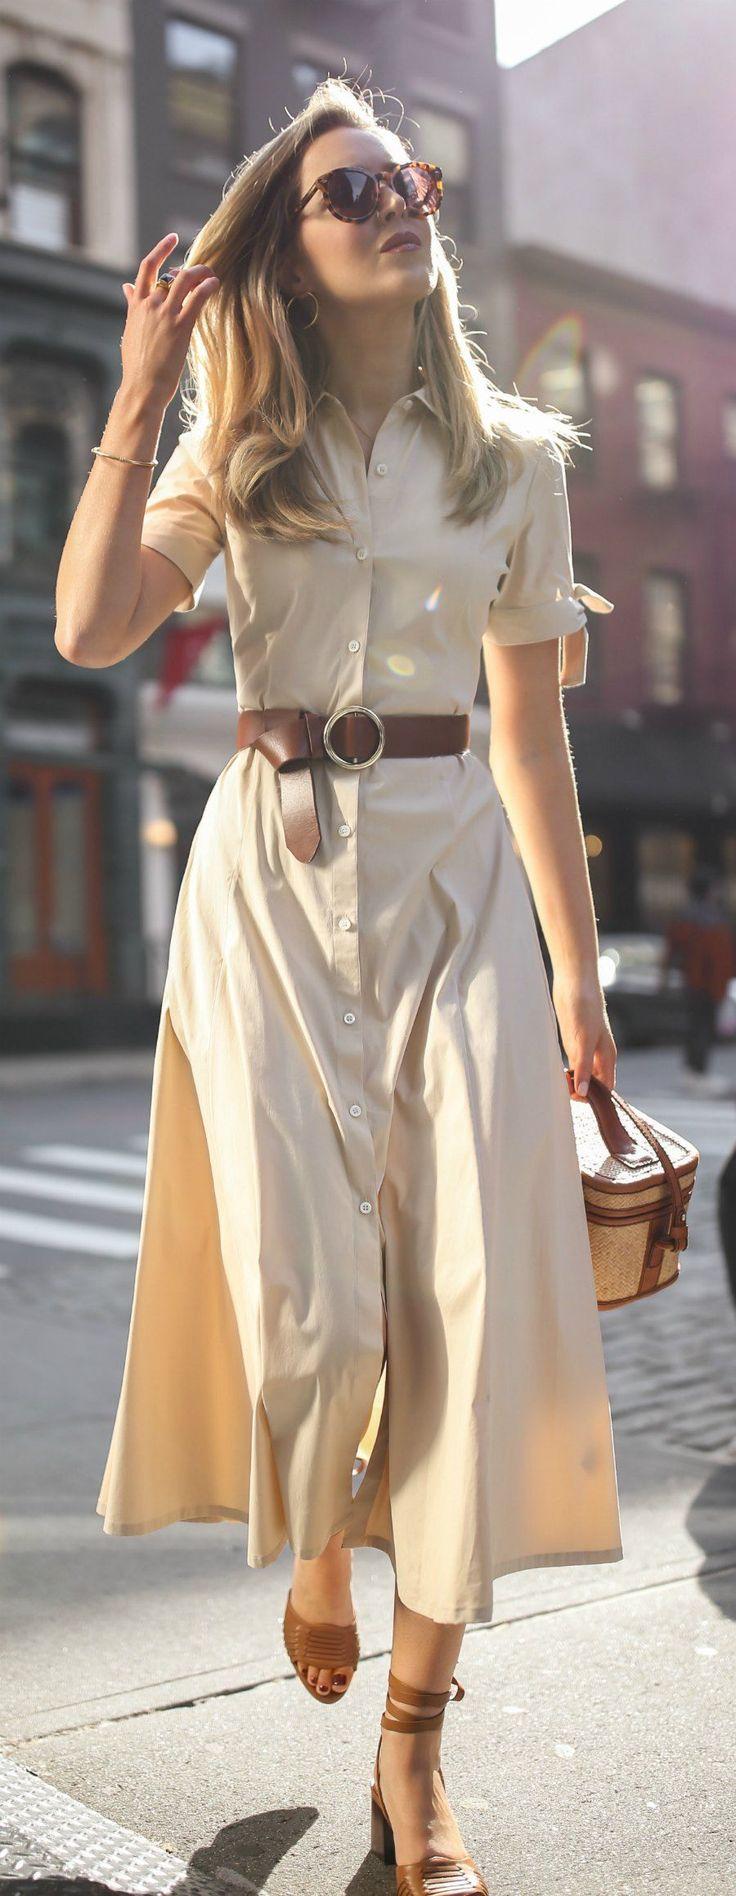 Click for outfit details! // Khaki short sleeve button down midi dress, brown waist belt, cat eye sunglasses, tan heeled sandals, wicker straw box bag…